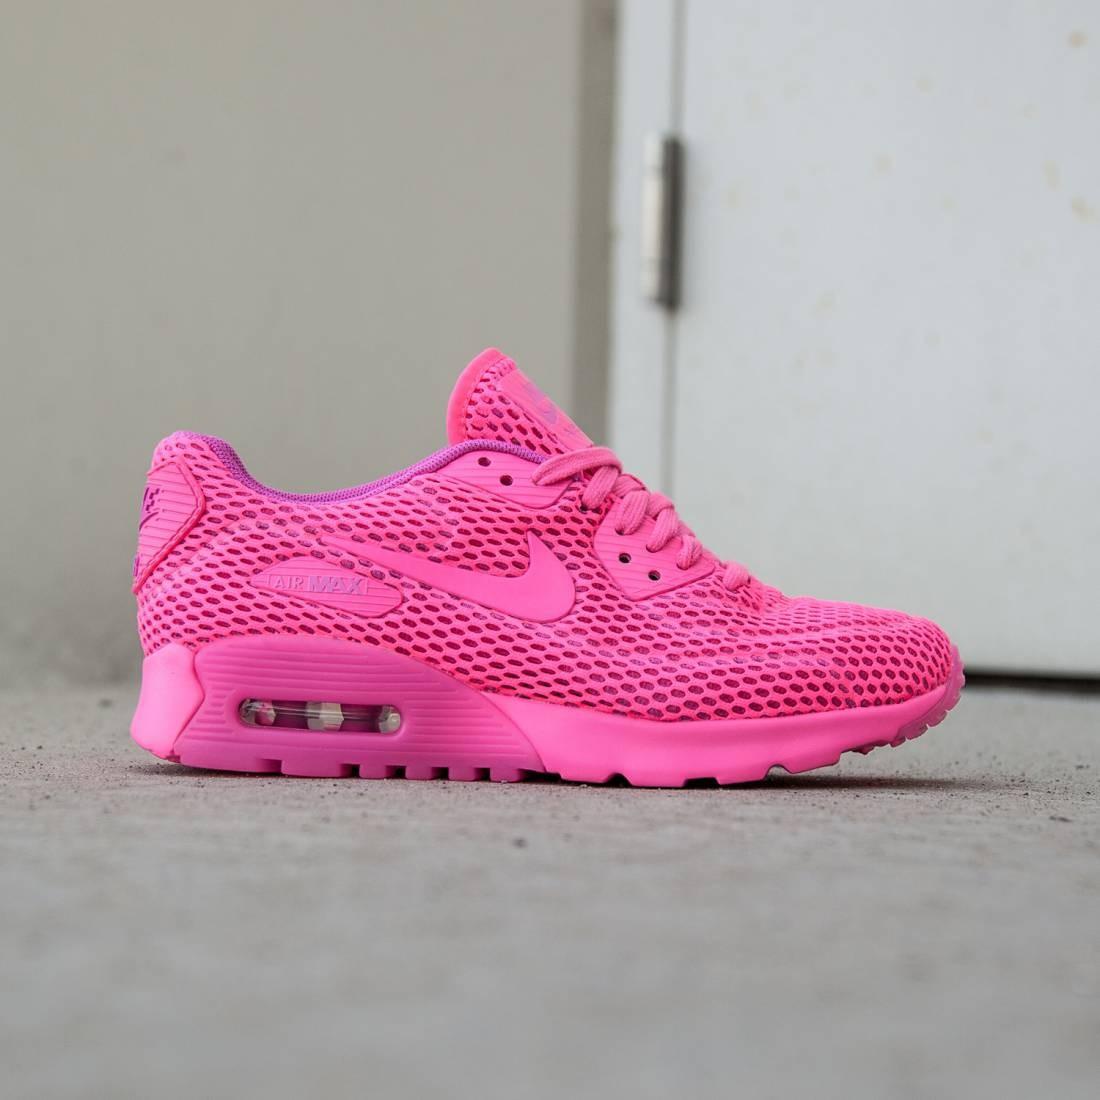 new concept 9beb0 8ea00 Nike Air Max 90 Ultra Breathe Pink vivoentertainments.co.uk